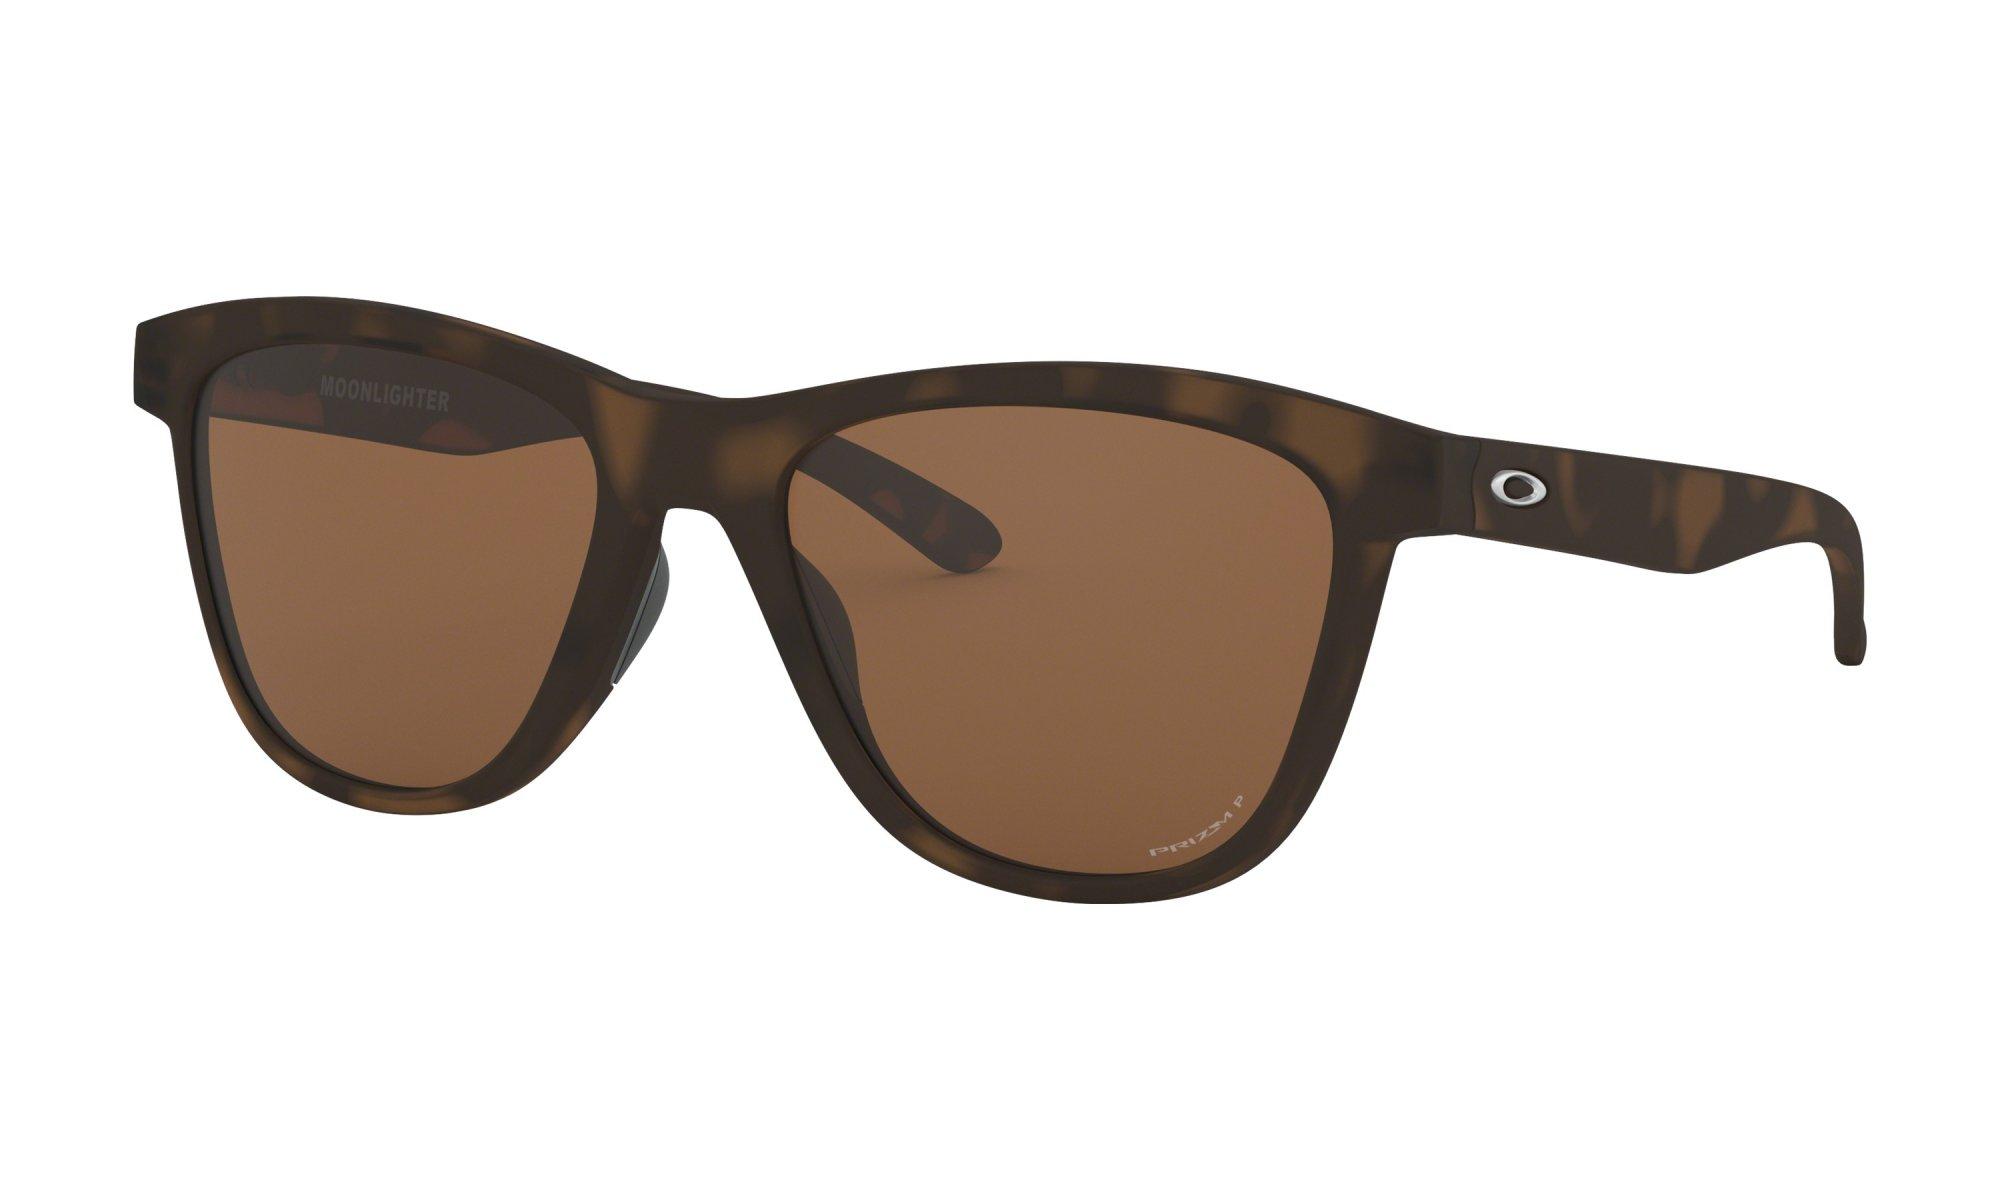 Oakley Moonligher Sunglasses